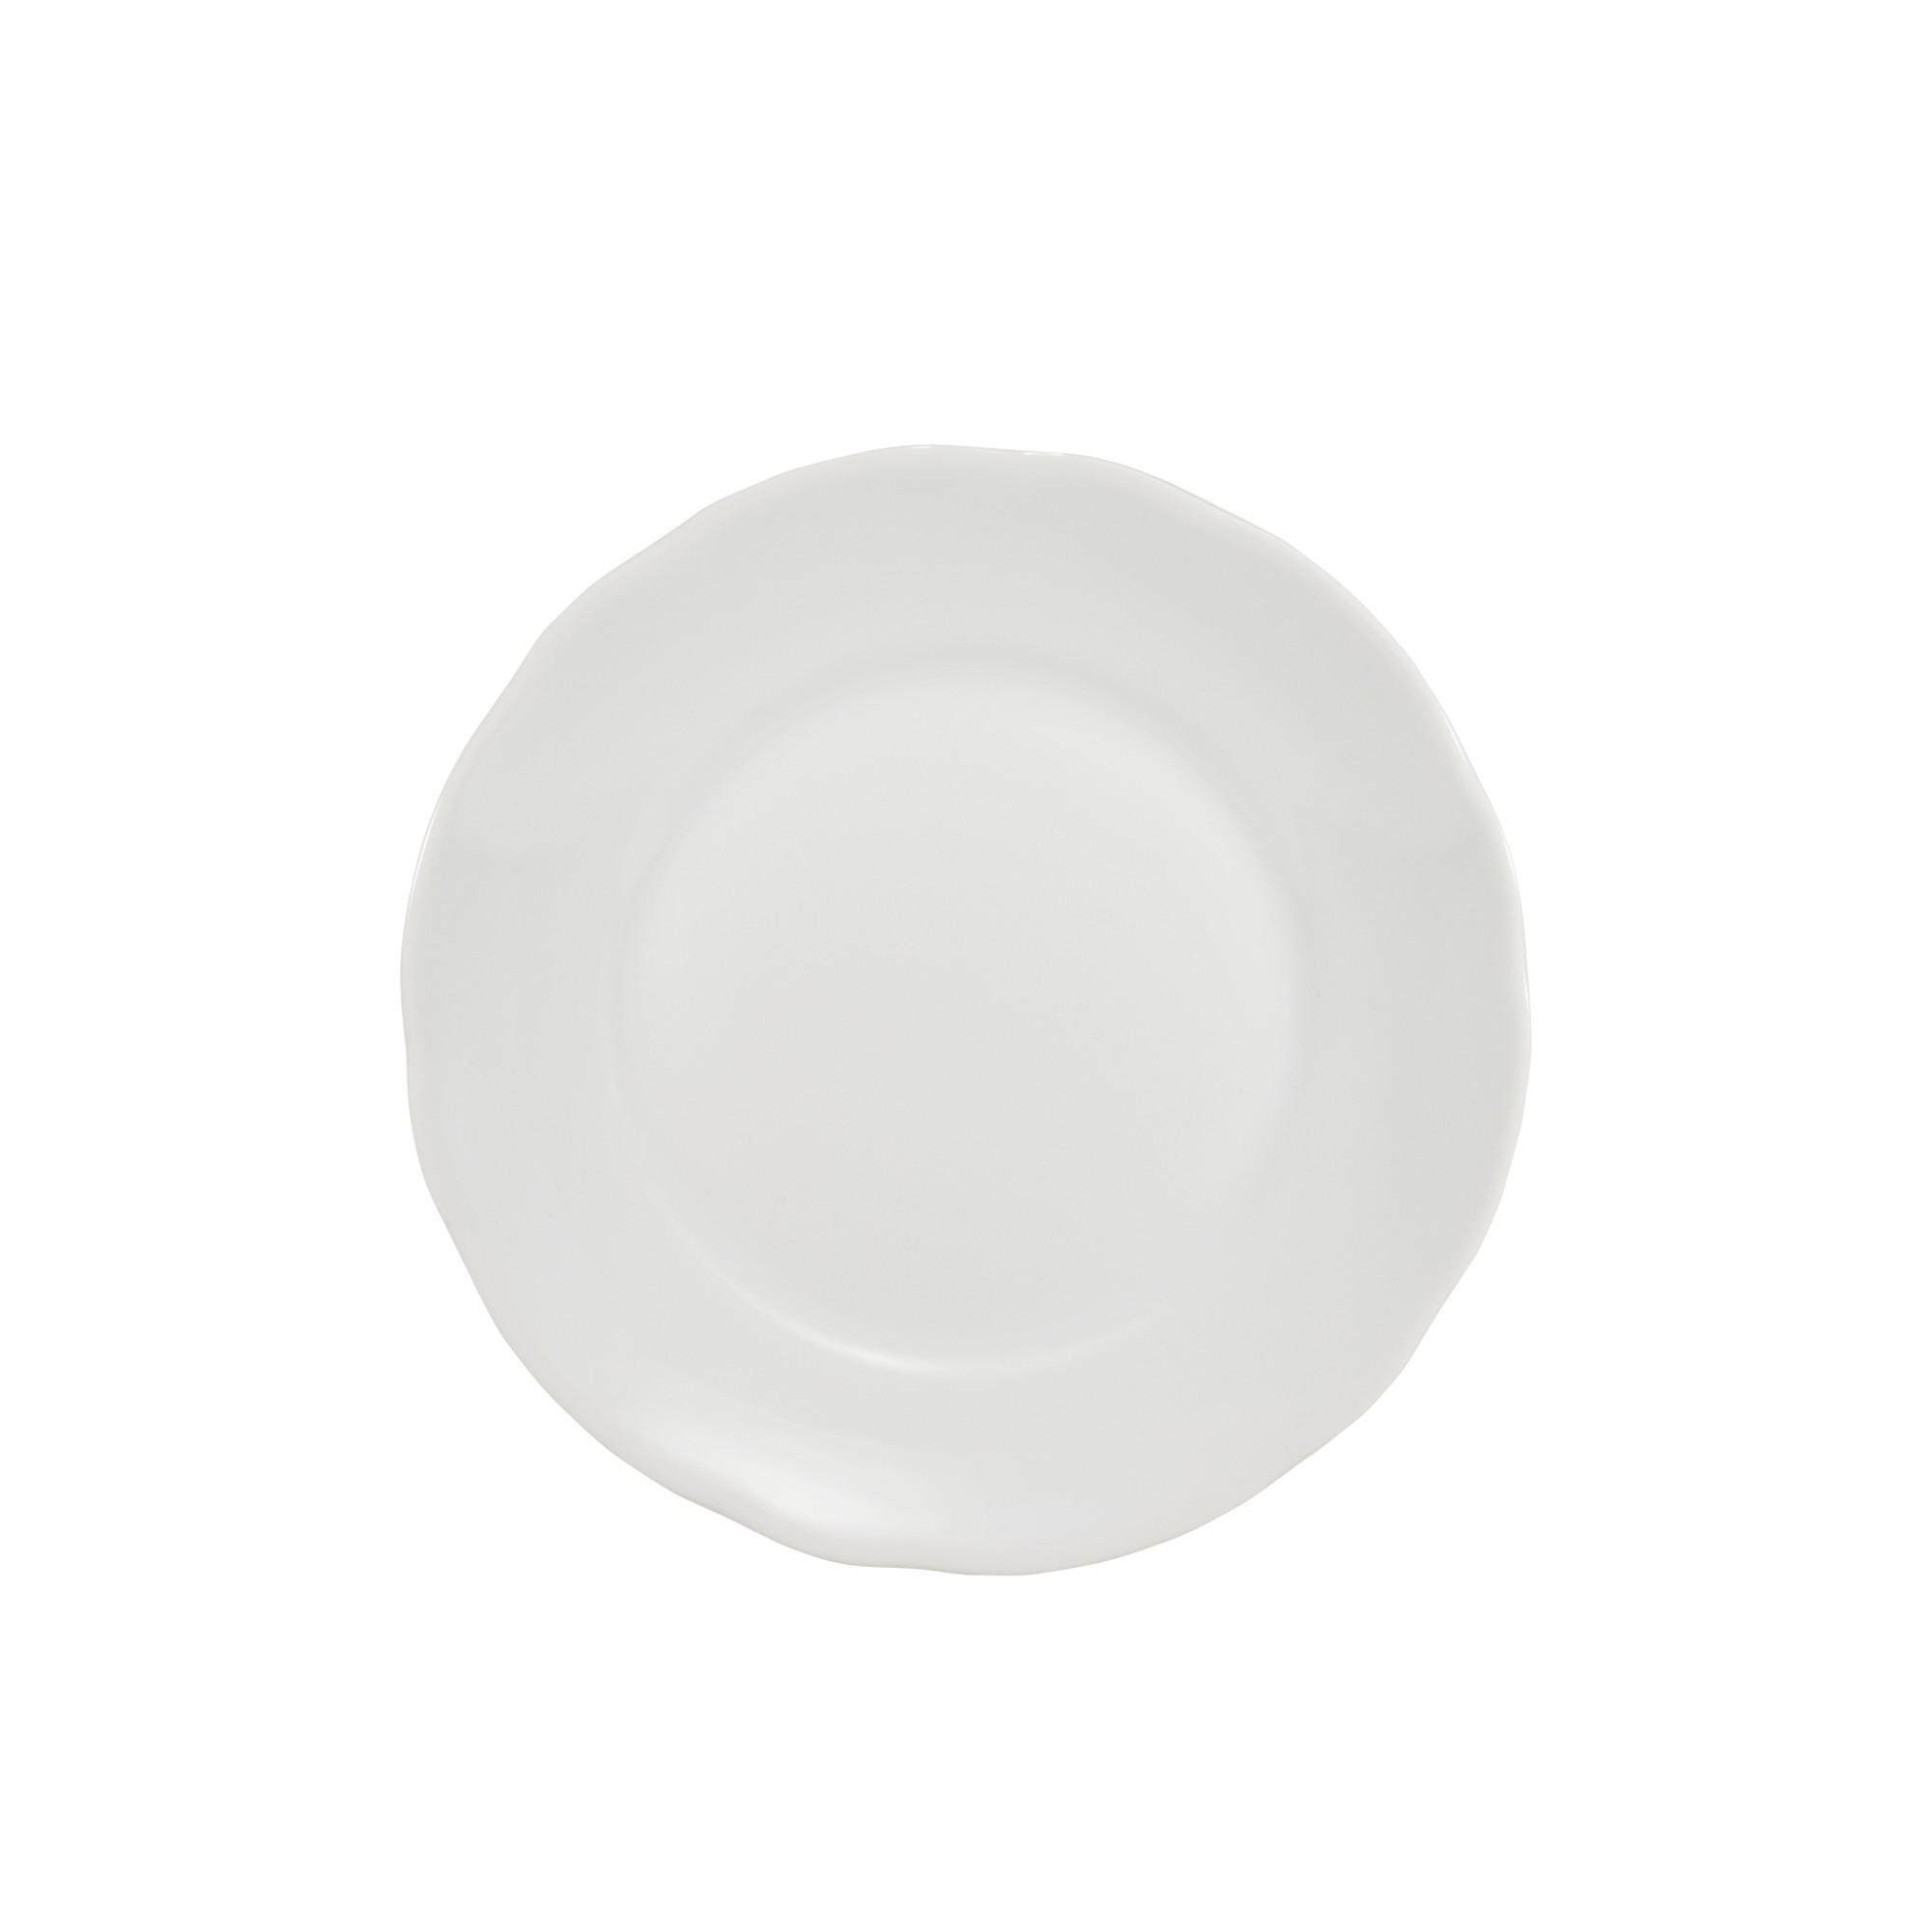 Prato Sobremesa Redondo de Porcelana 19cm Branco - Schmidt